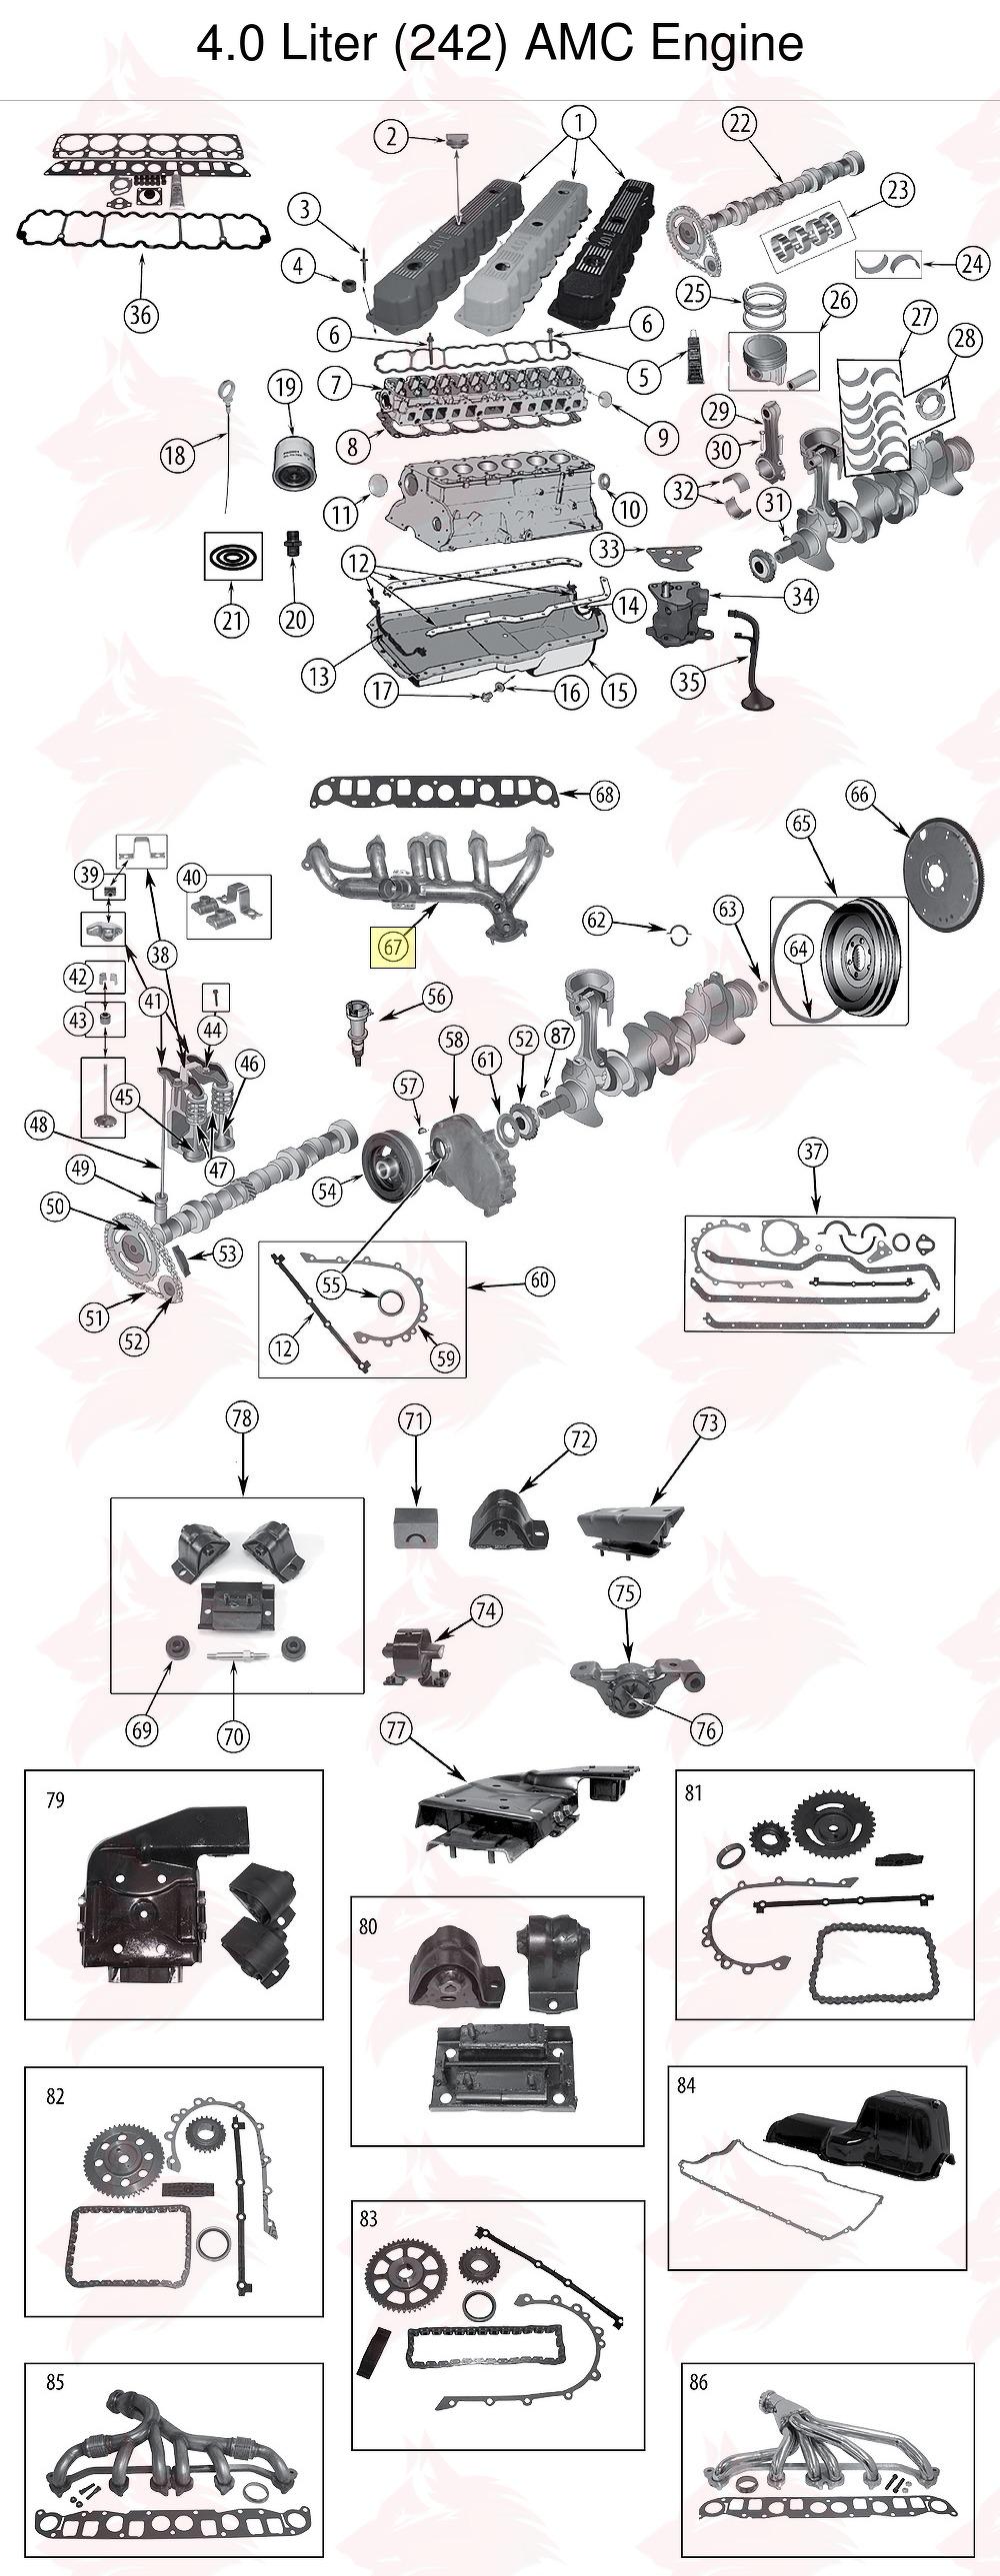 Auspuffkr U00fcmmer Jeep Wrangler Yj 1991  1995  4 0 L